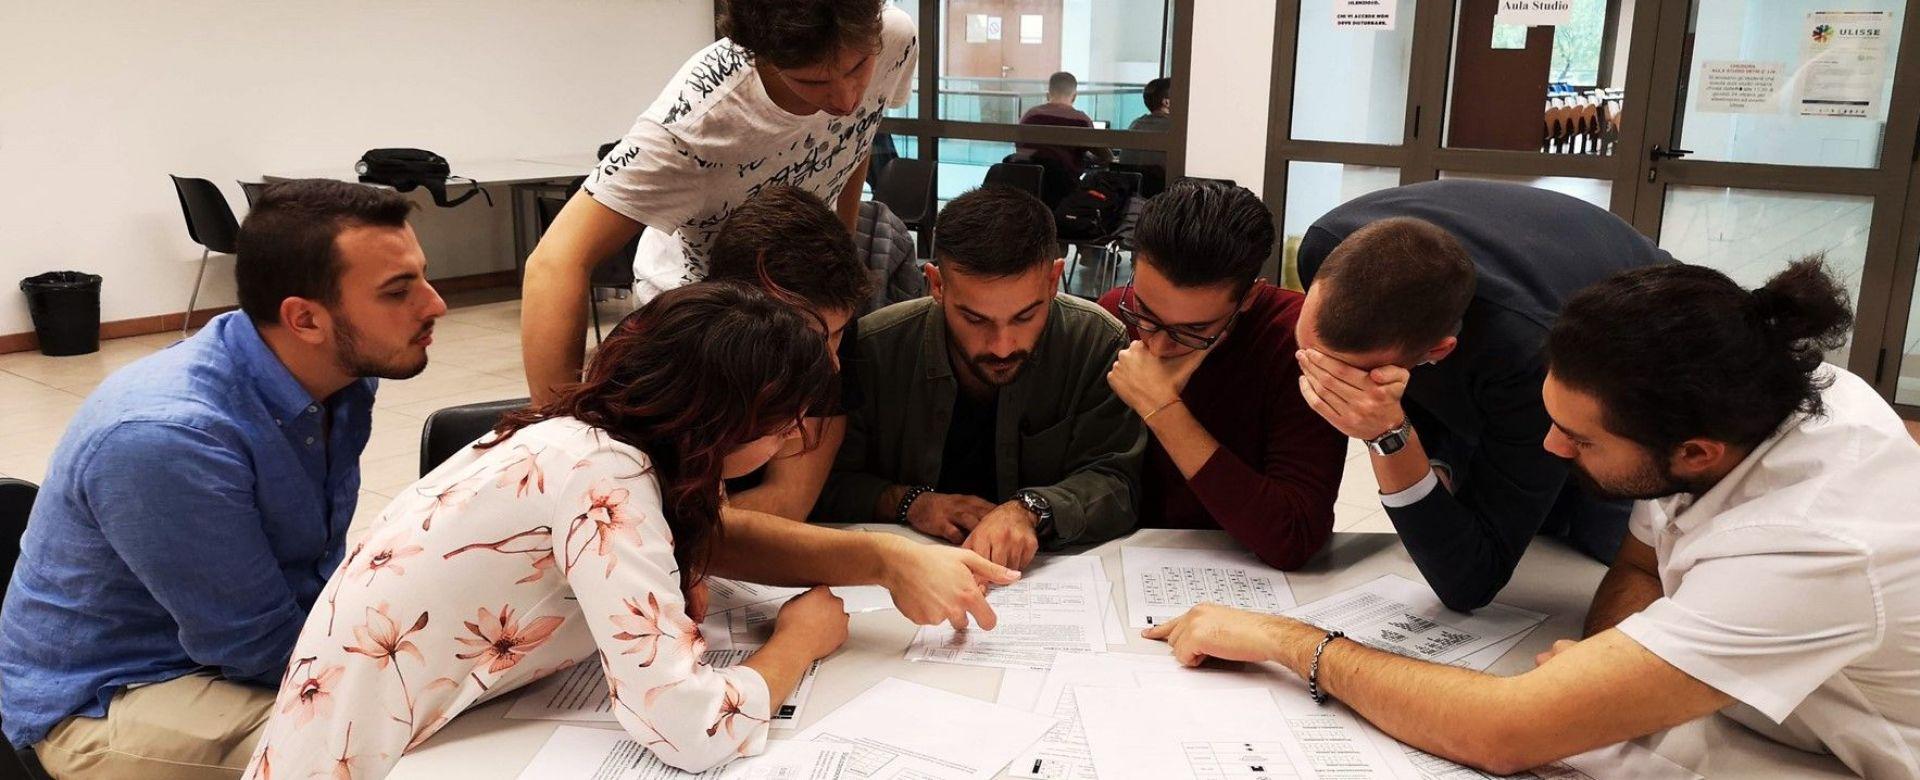 31.10.2019 - Tappa Ulisse @Fondazione Studi Universitari di Vicenza